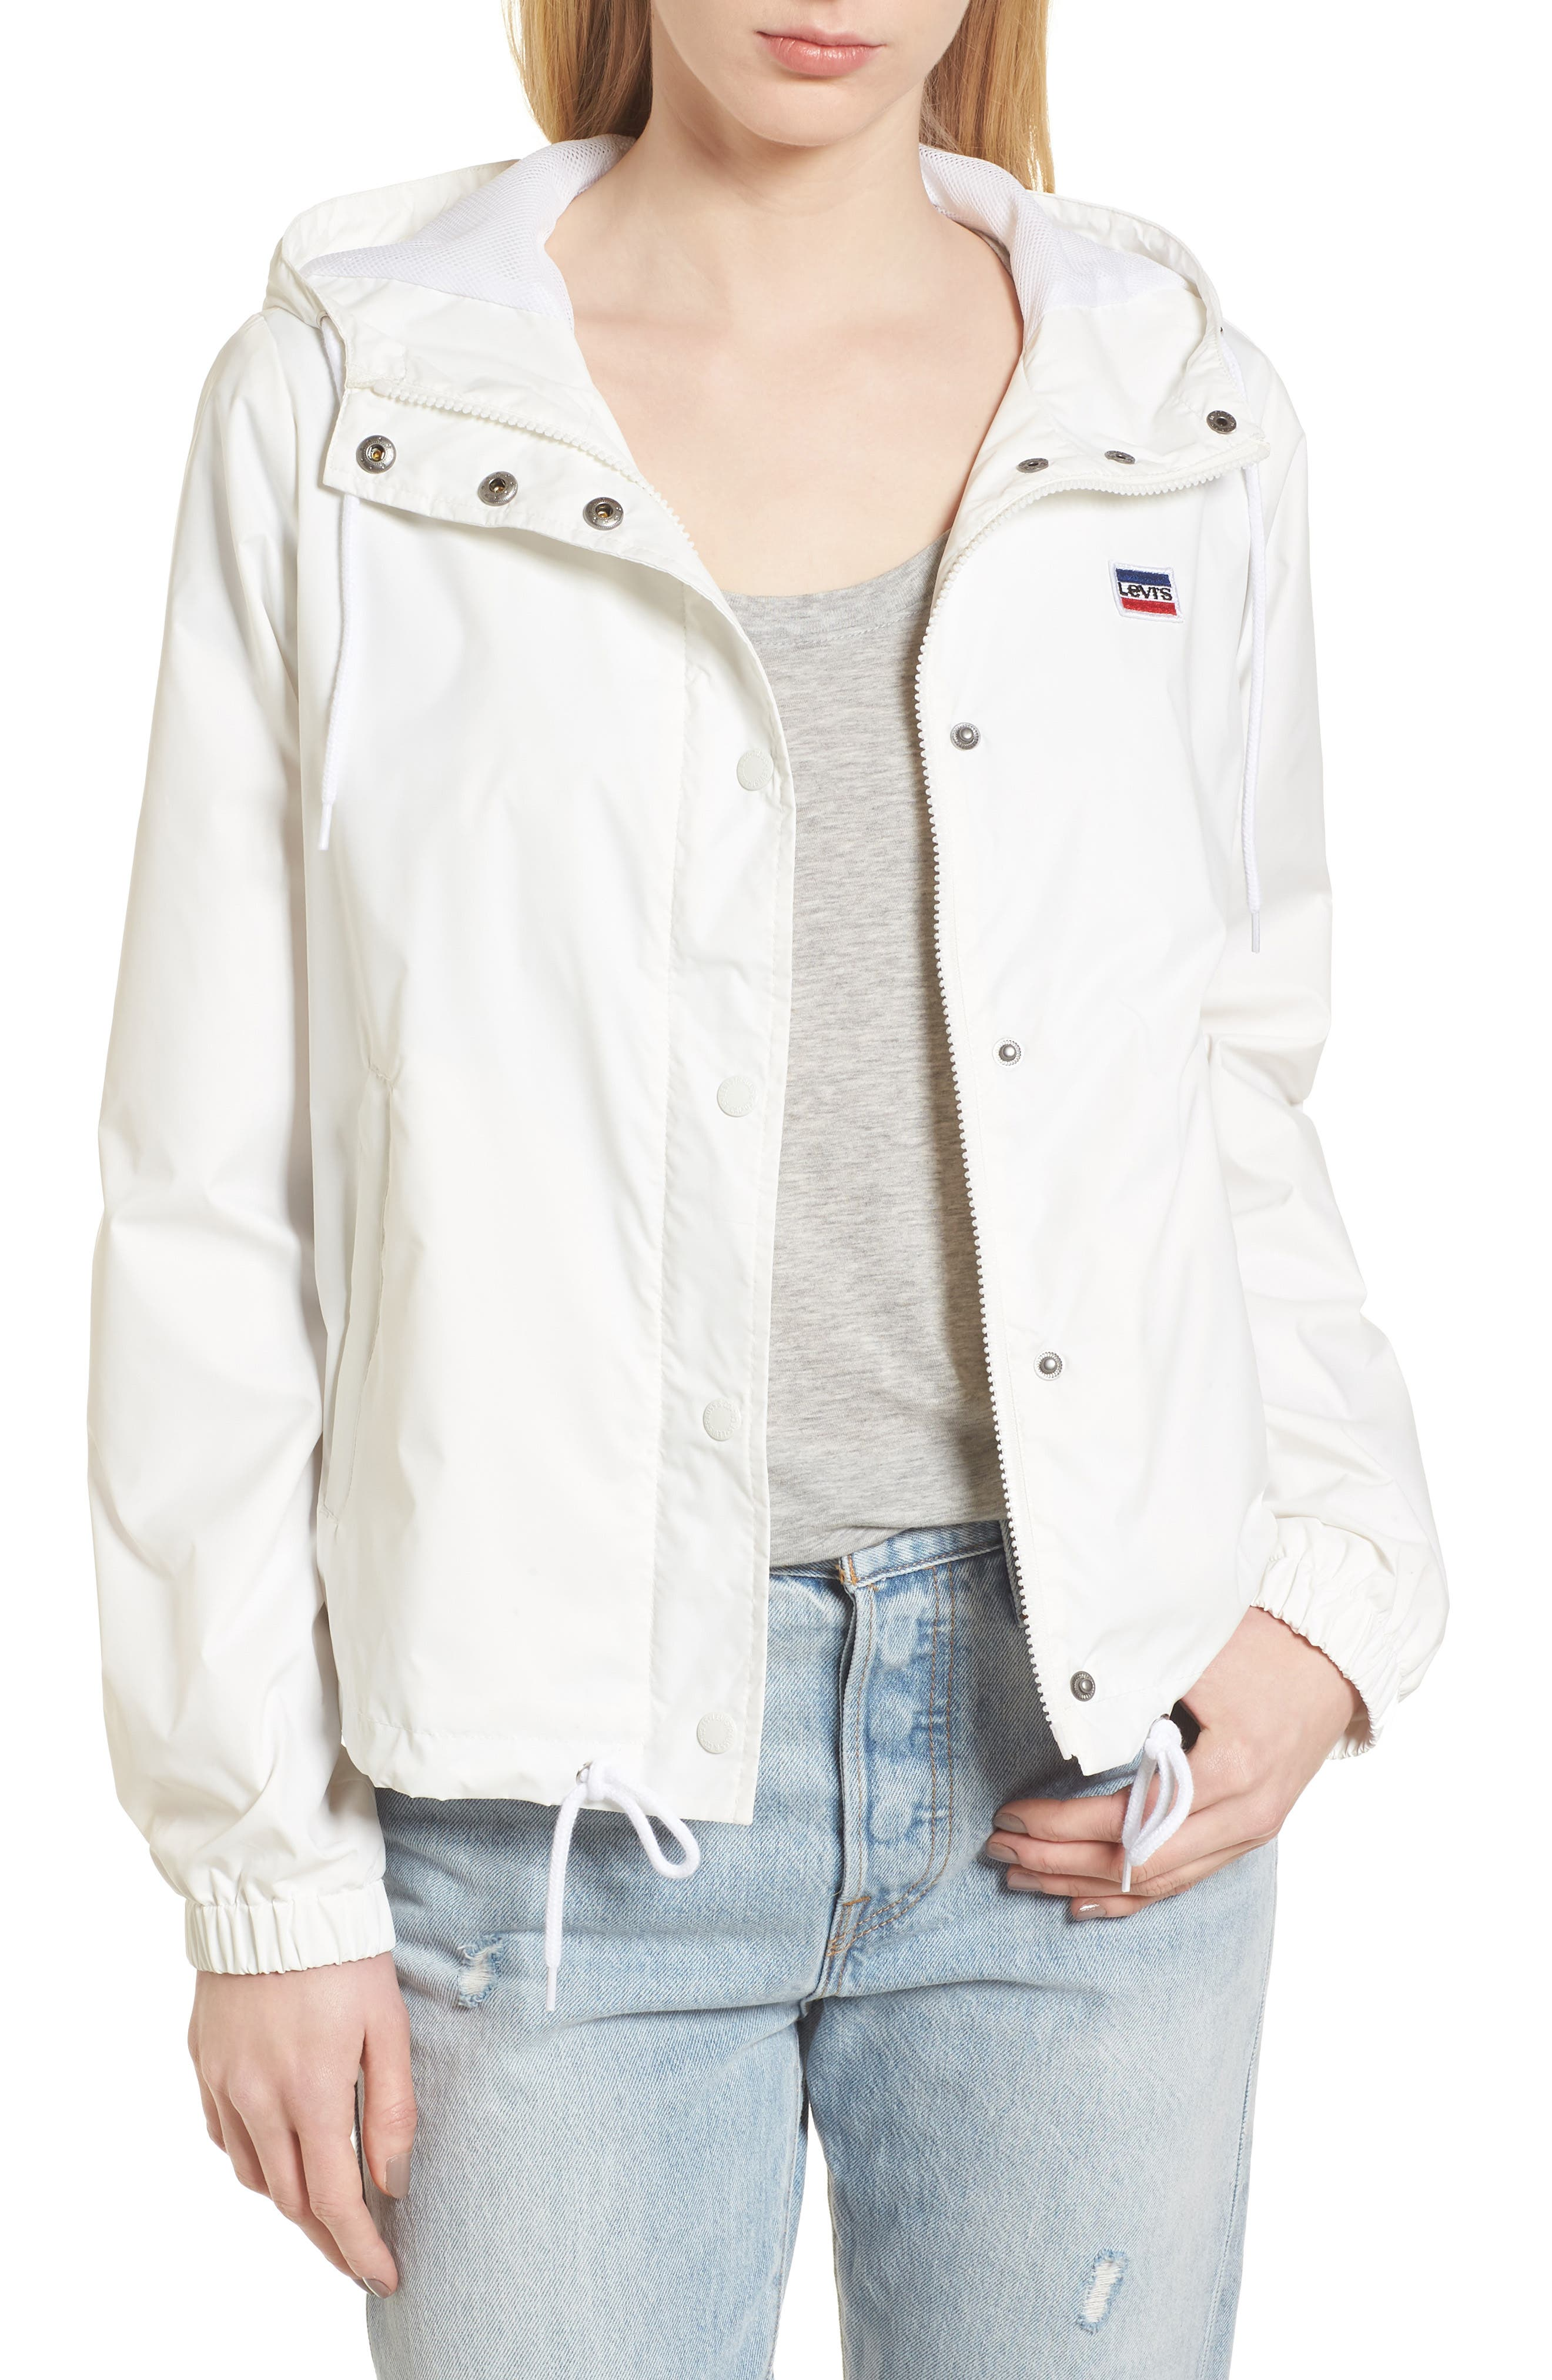 Retro Hooded Coach's Jacket,                             Main thumbnail 1, color,                             100